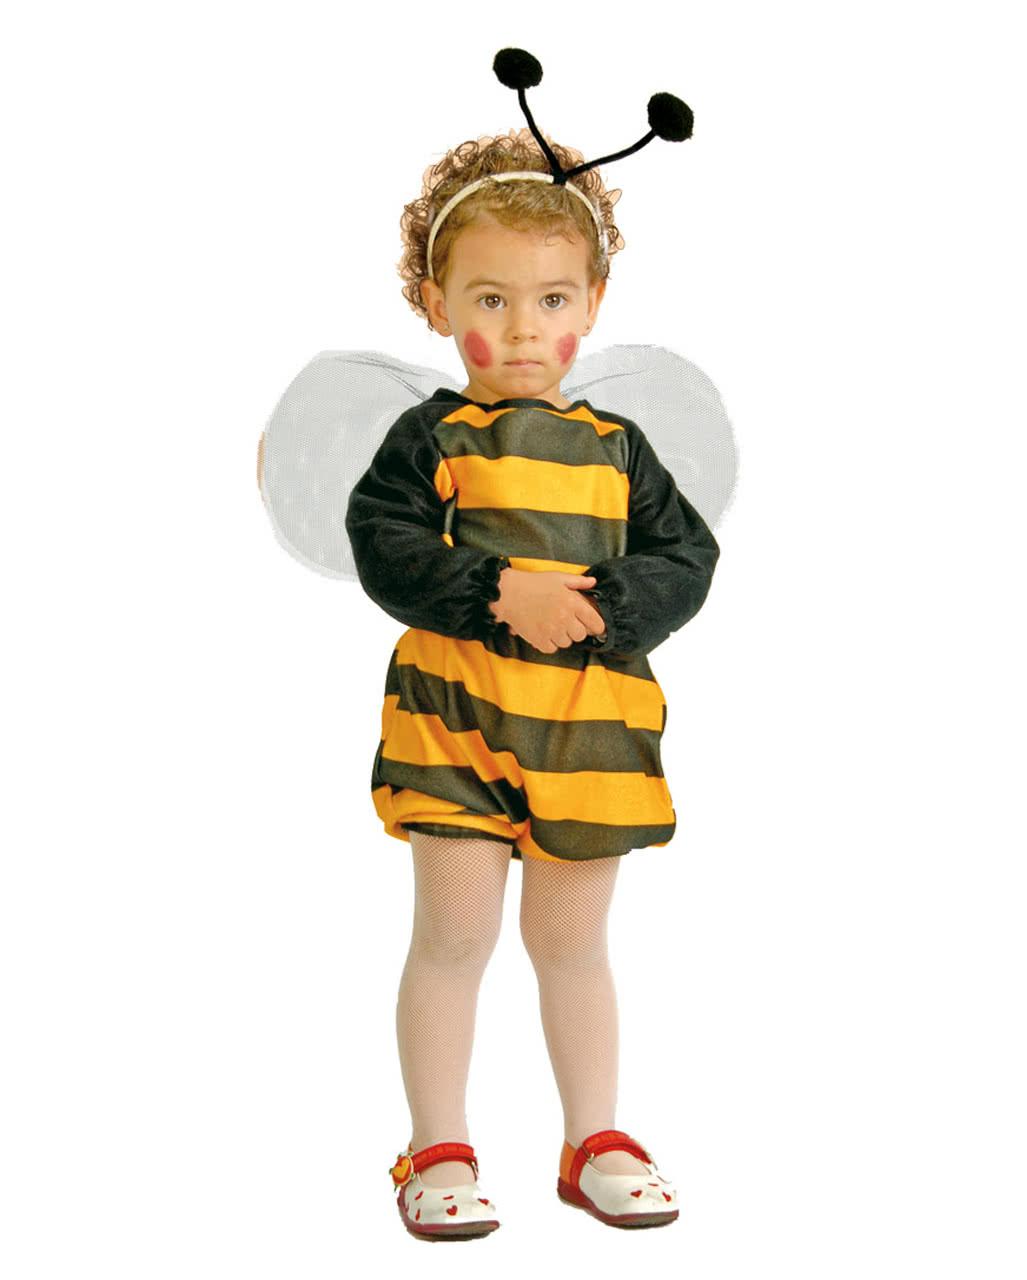 sc 1 st  Horror-Shop.com & Bee Baby Costume for carnival | horror-shop.com